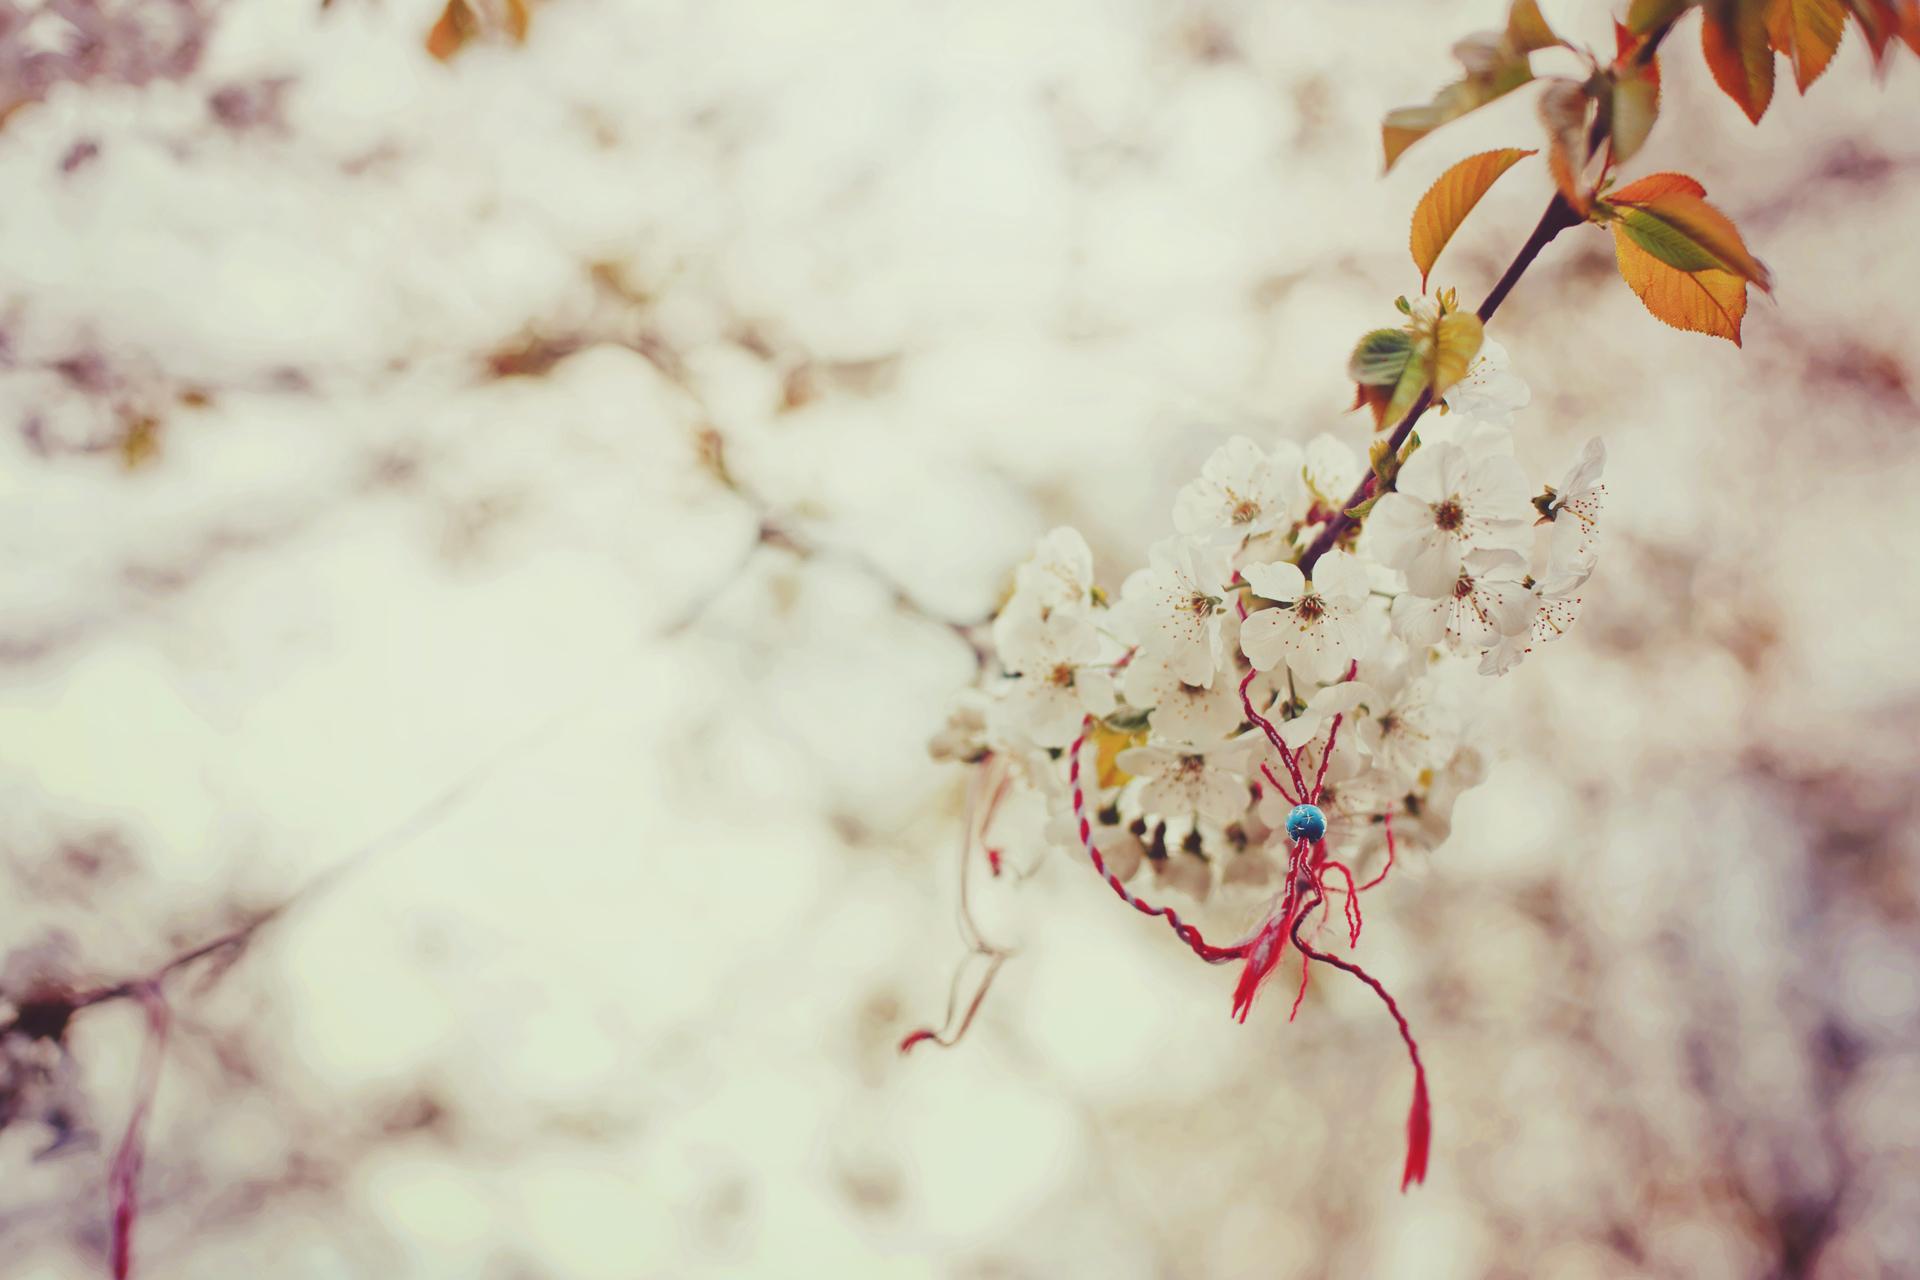 Rain Drop Wallpaper Hd صور ورود جميلة صور هادئة